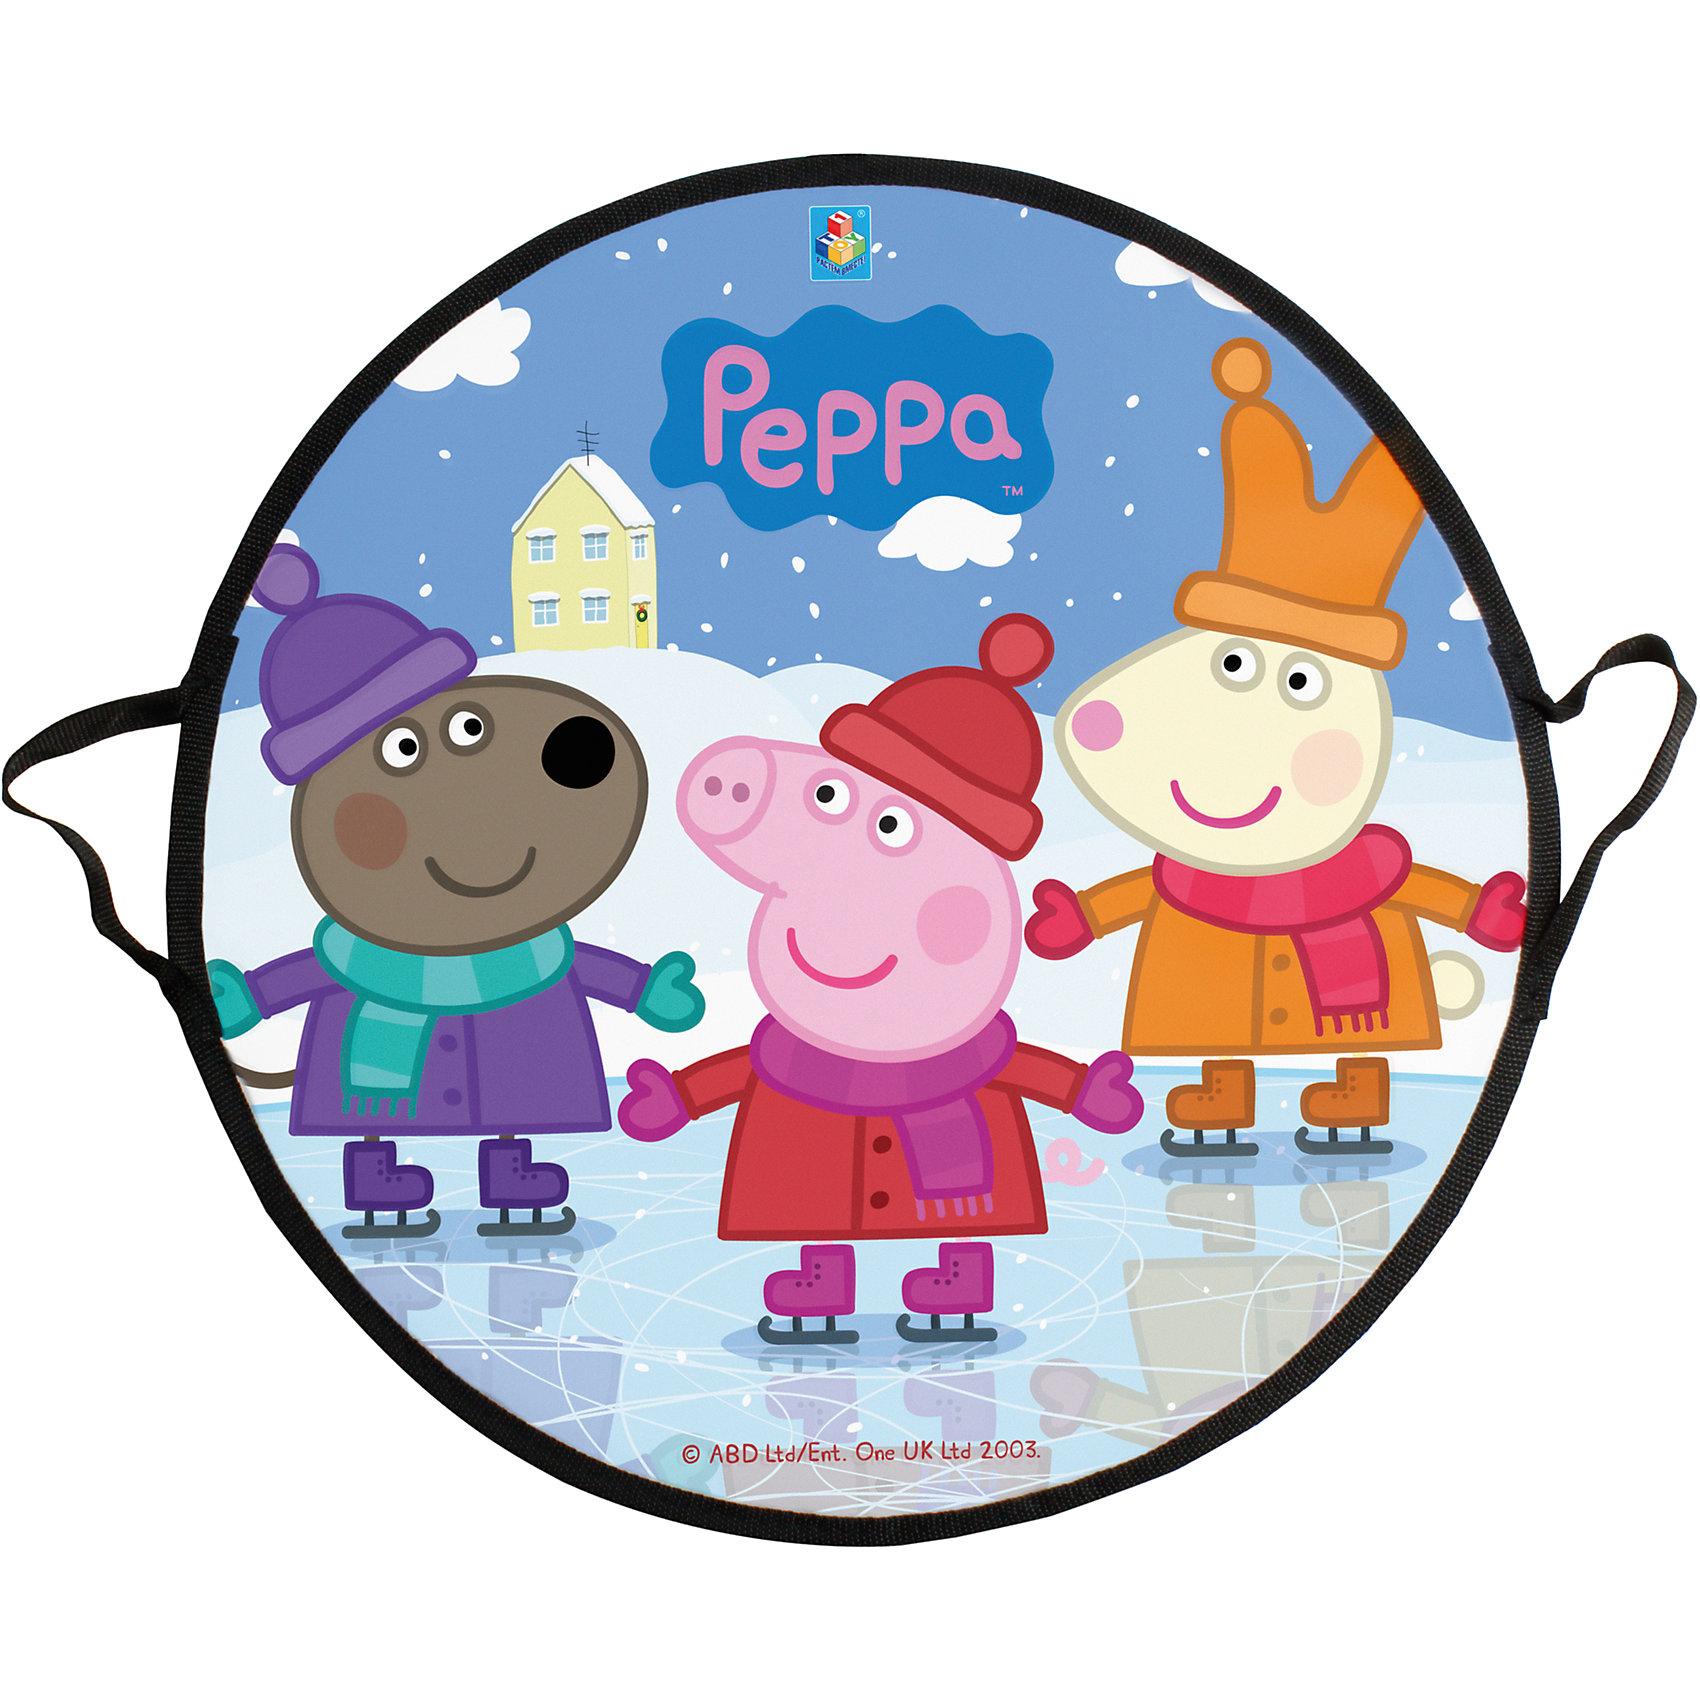 - Ледянка Пеппа, 52 см, круглая, Peppa, 1toy цена